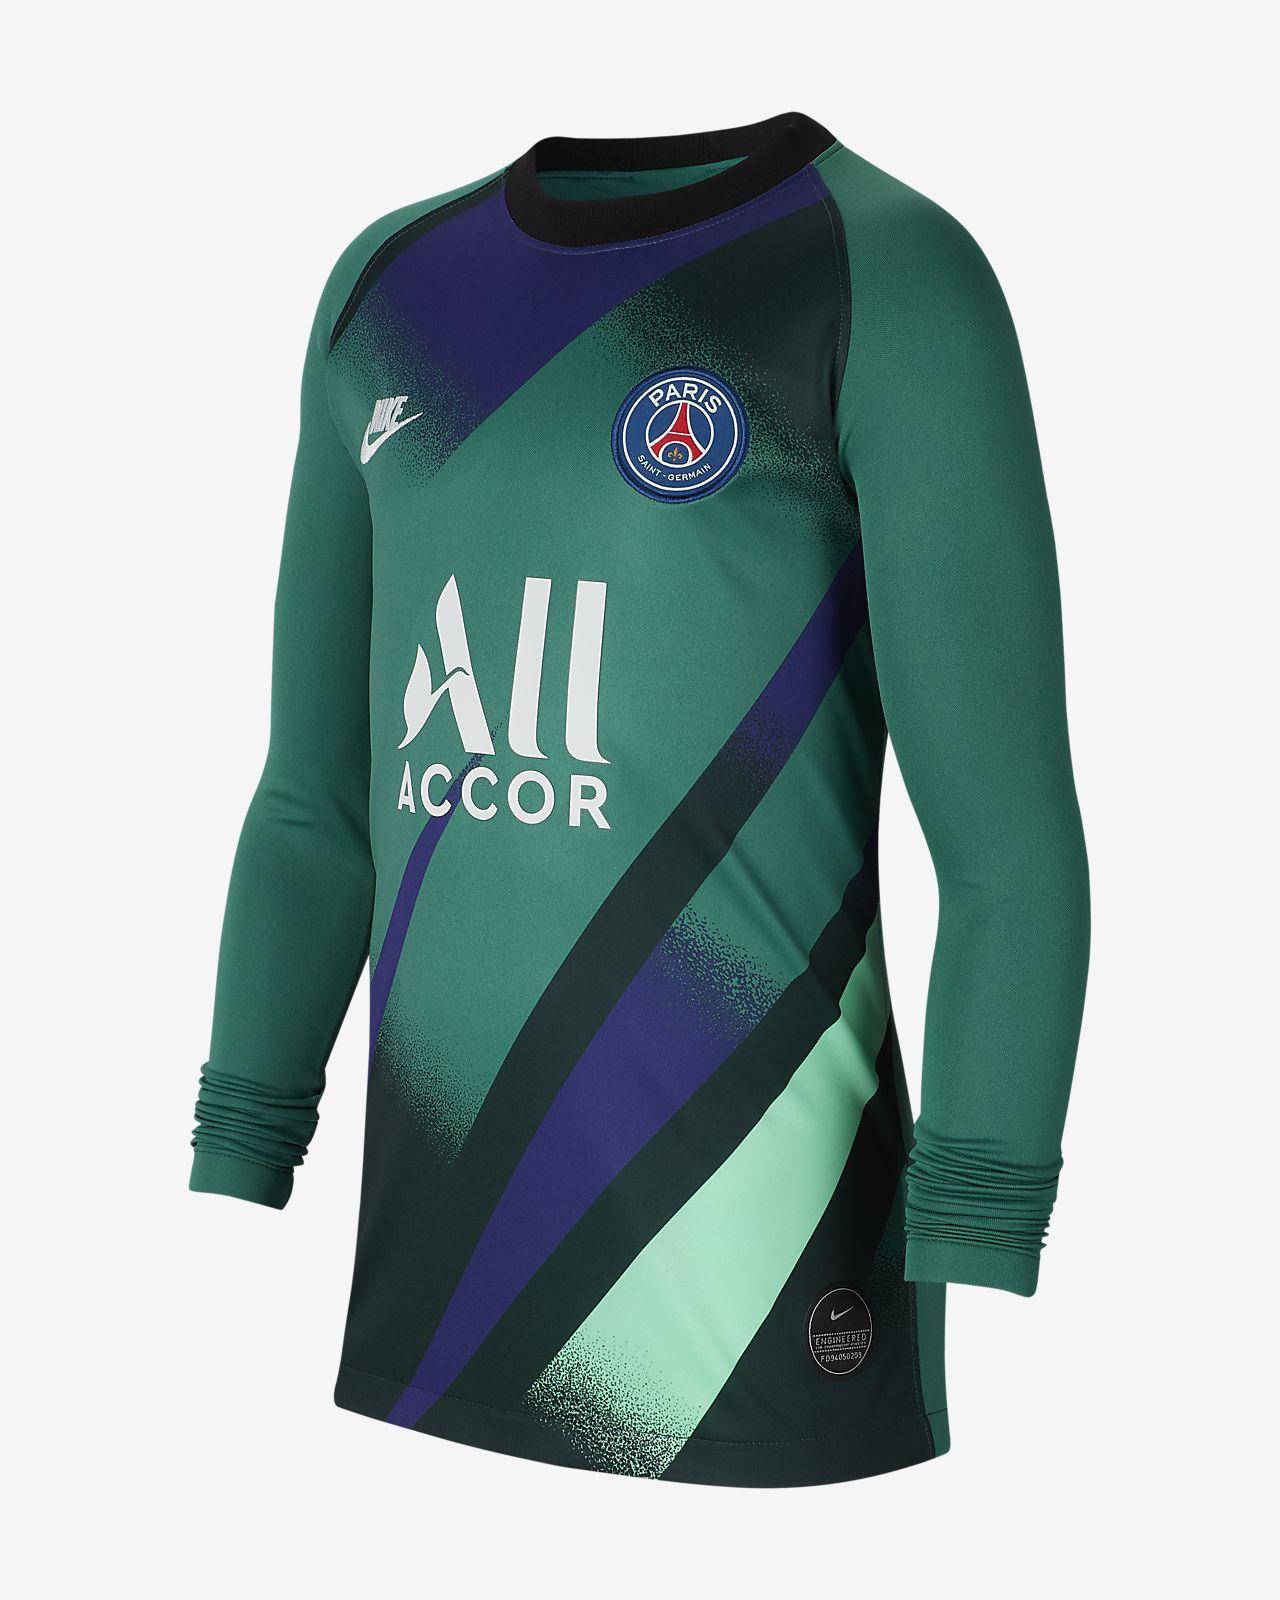 Paris Saint-Germain 2019/20 Stadium Goalkeeper Third-fodboldtrøje til store børn